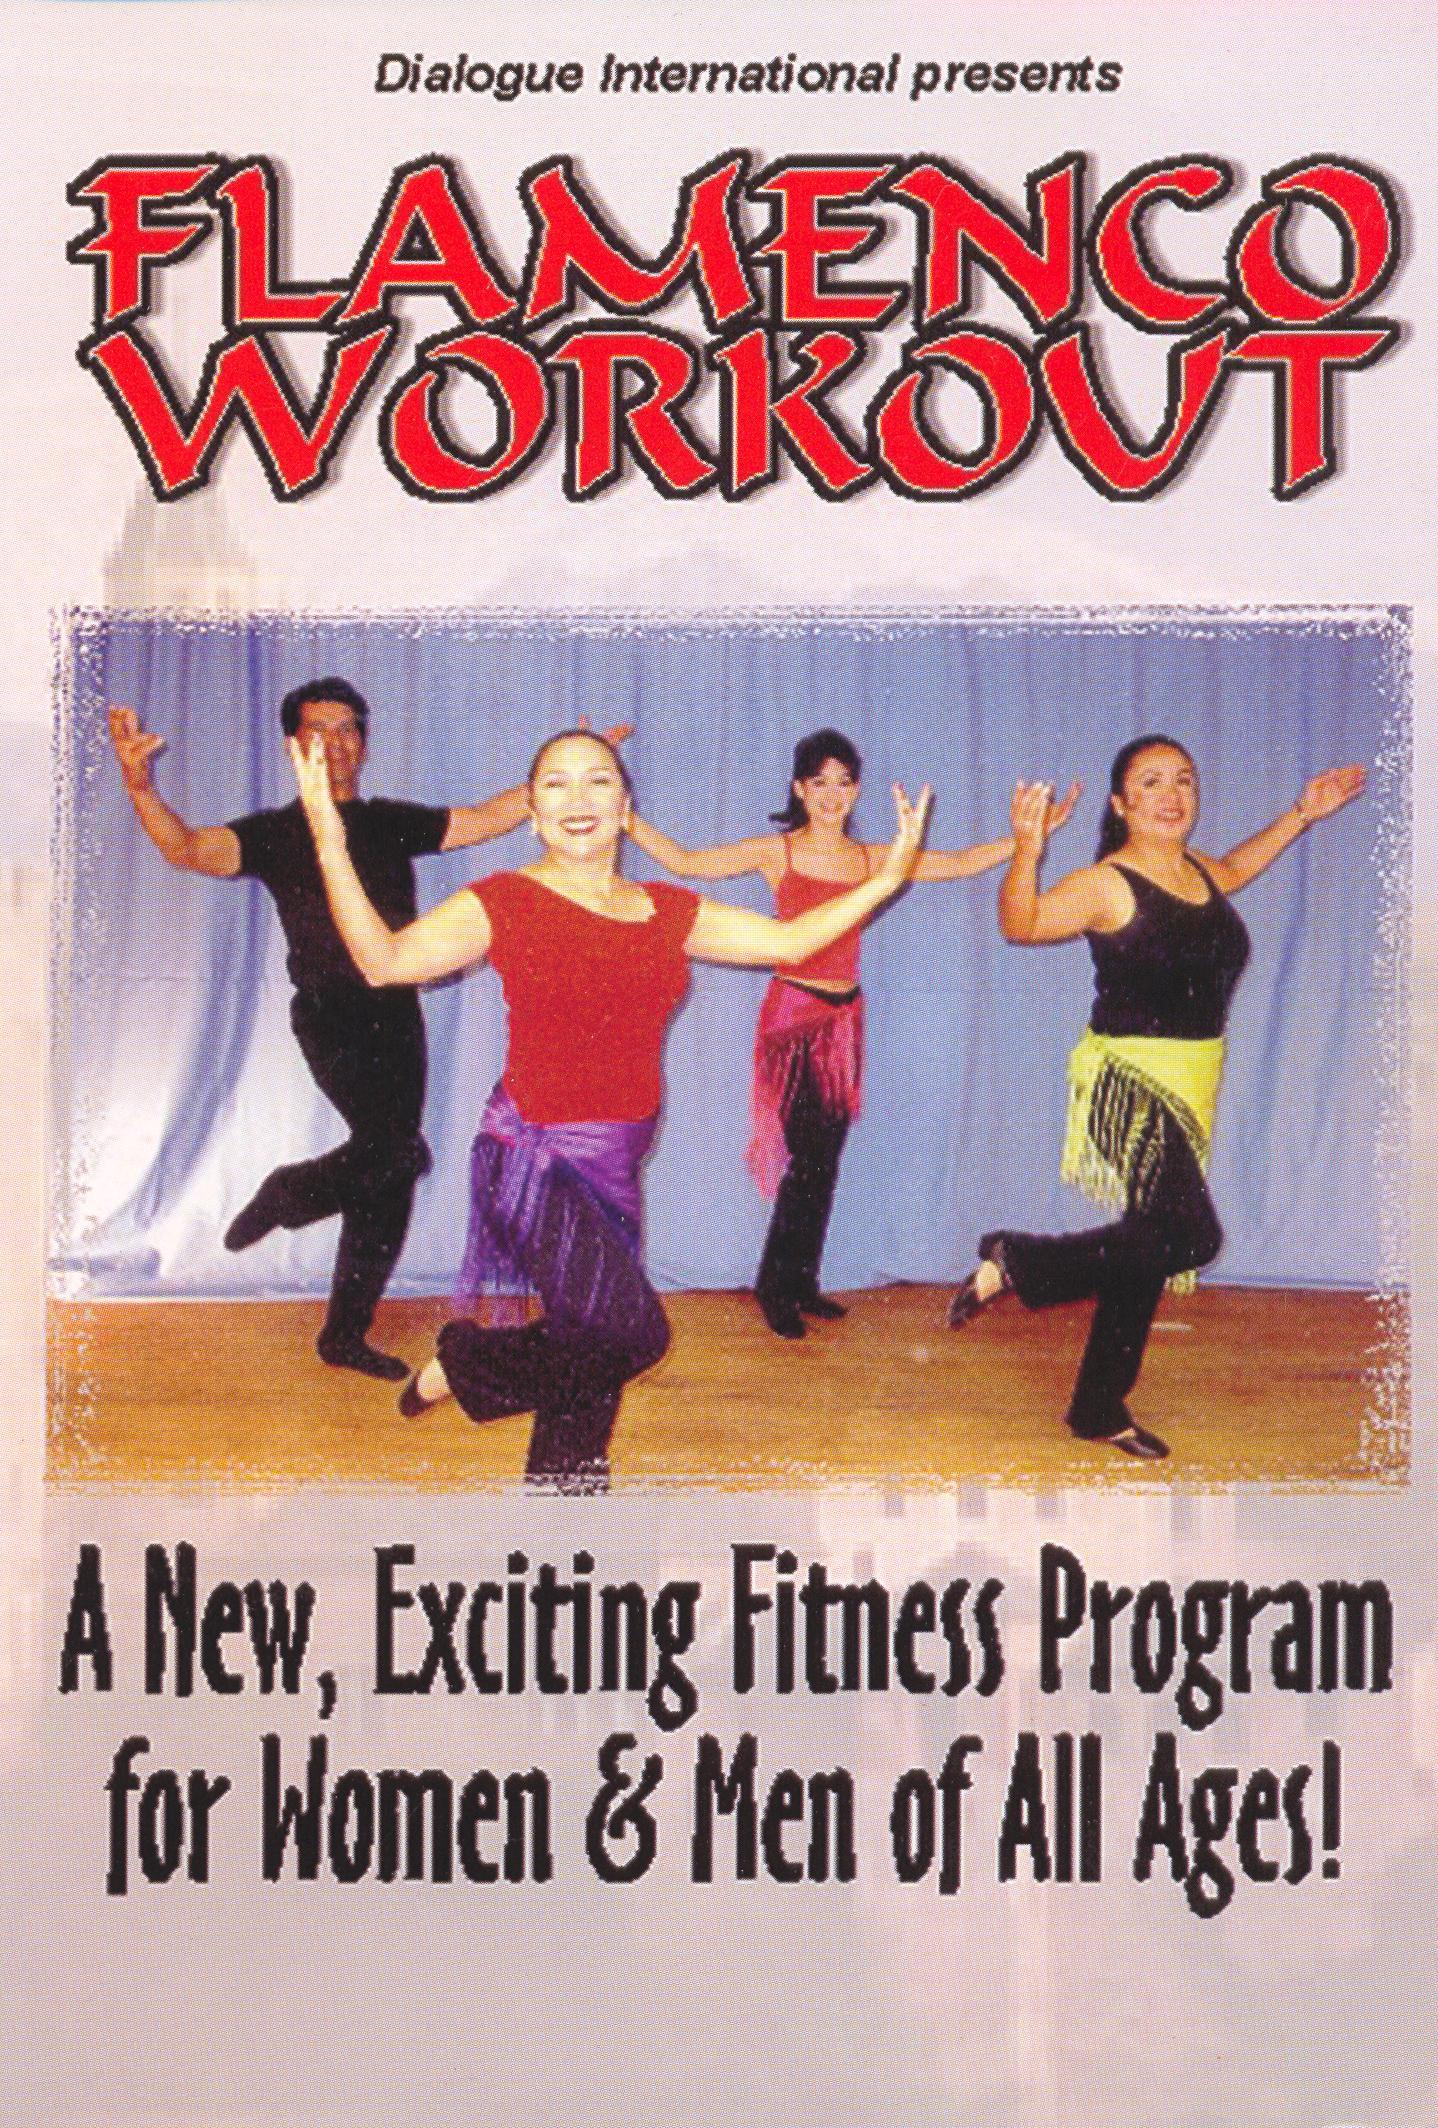 Flamenco Workout